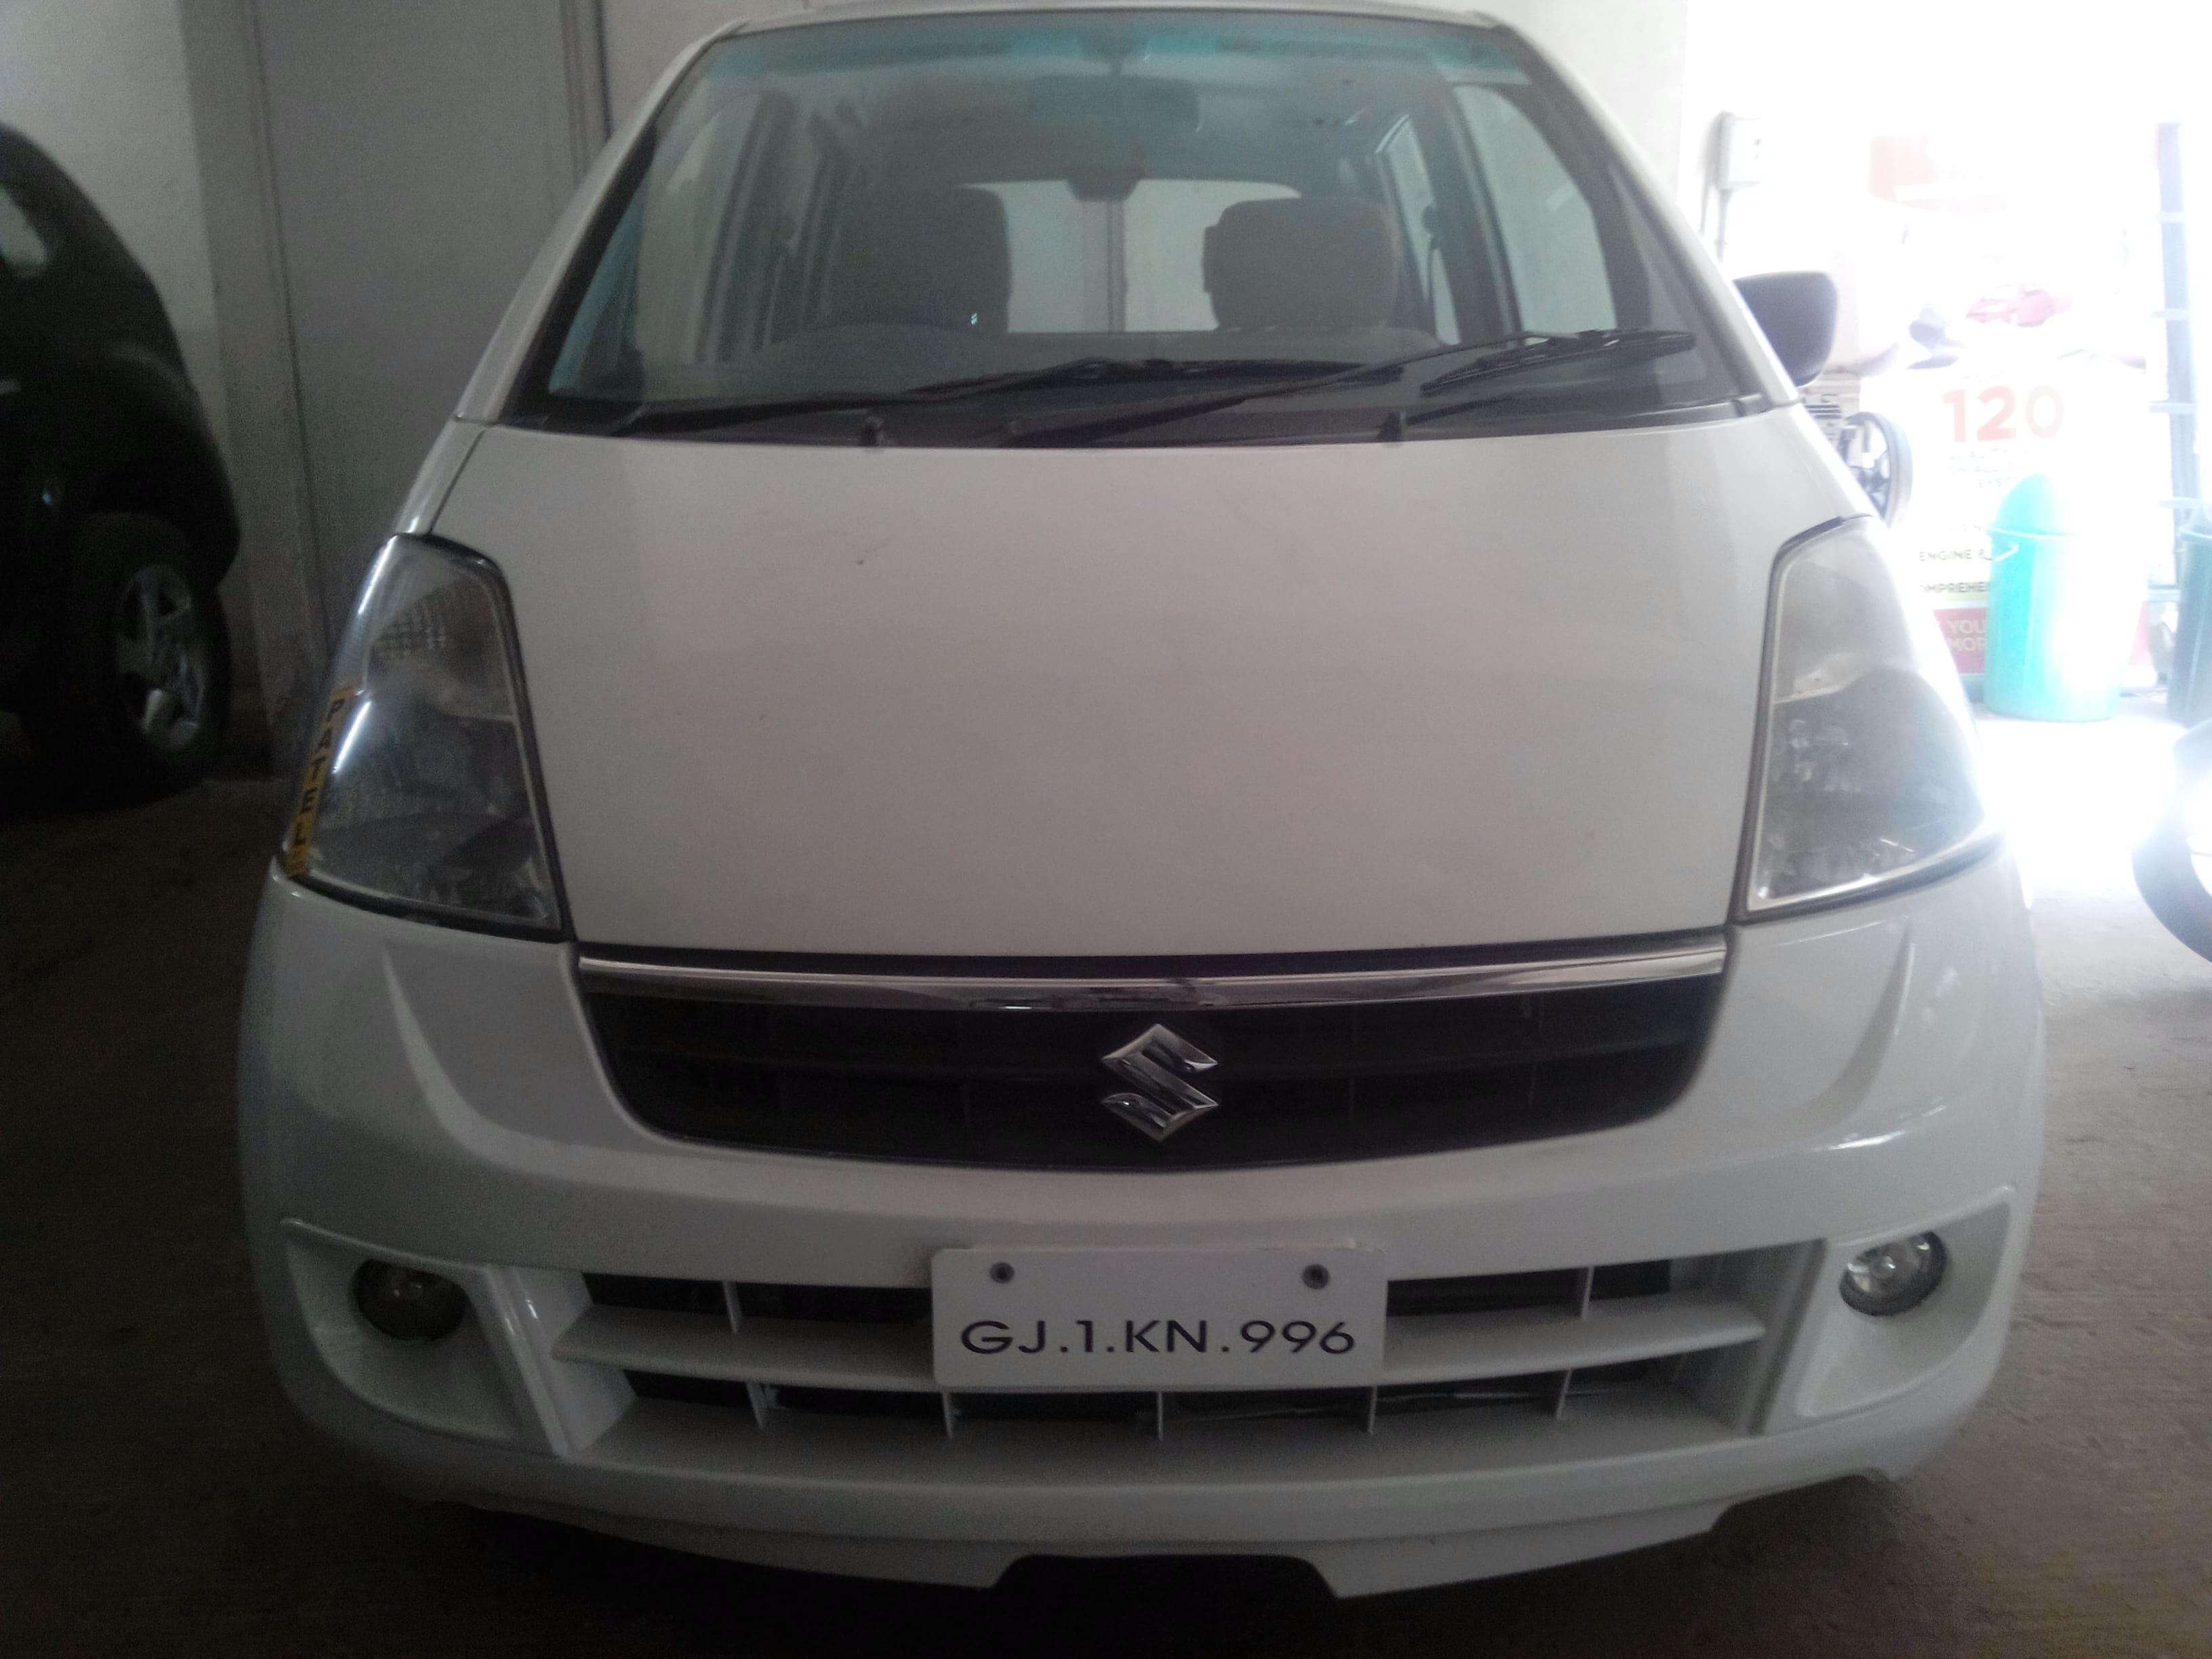 Used Maruti Zen Estilo LXI BS IV (Id-784007) Car in Ahmedabad